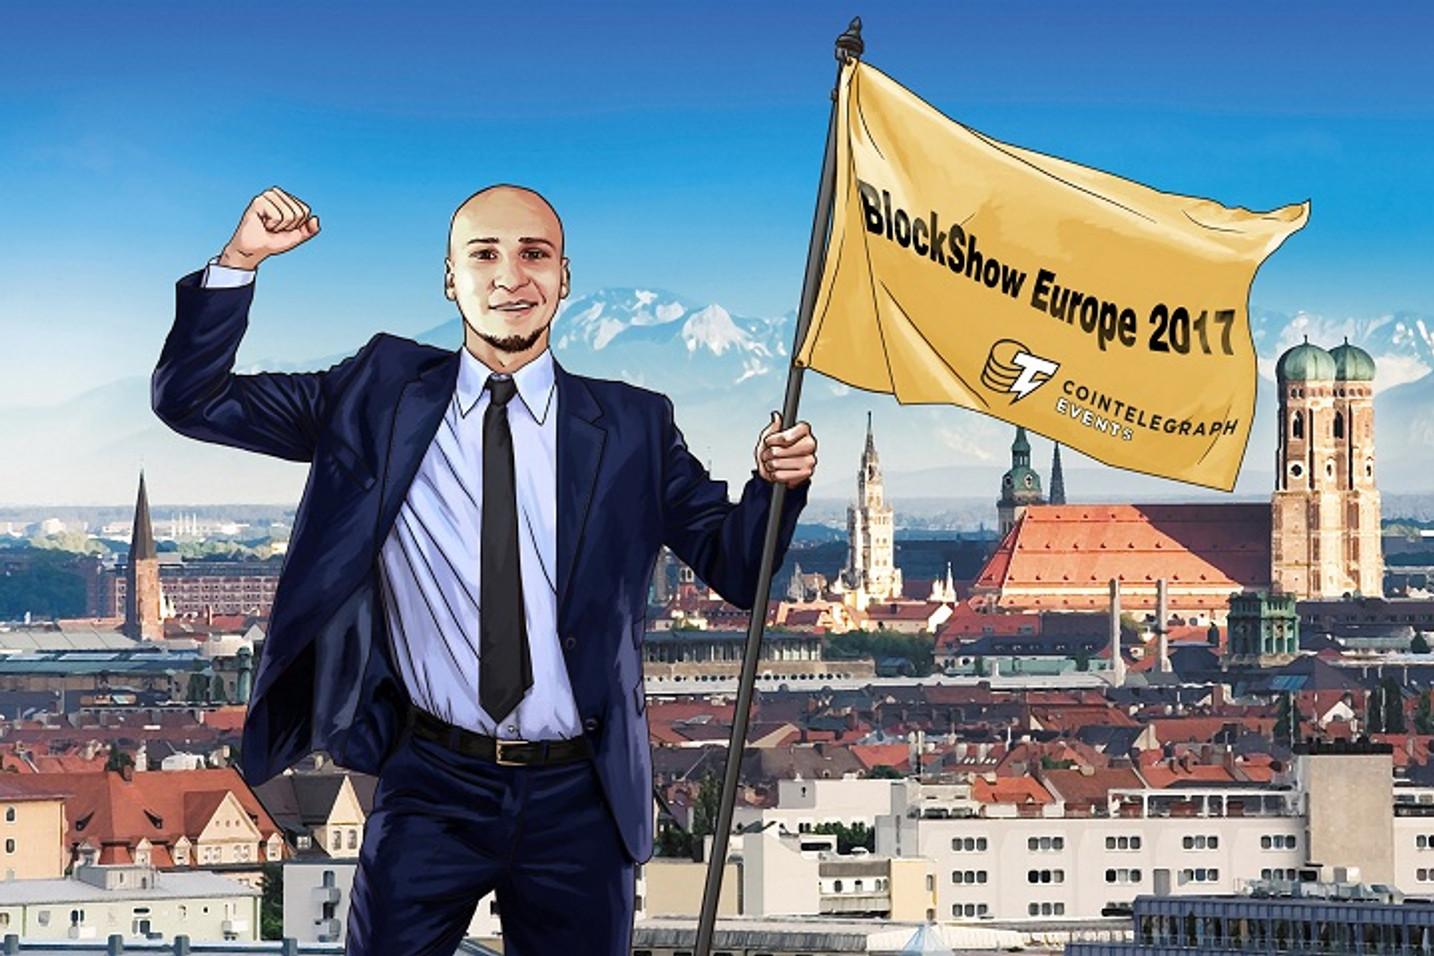 Cointelegraph to Showcase Blockchain Solutions in Munich in 2017